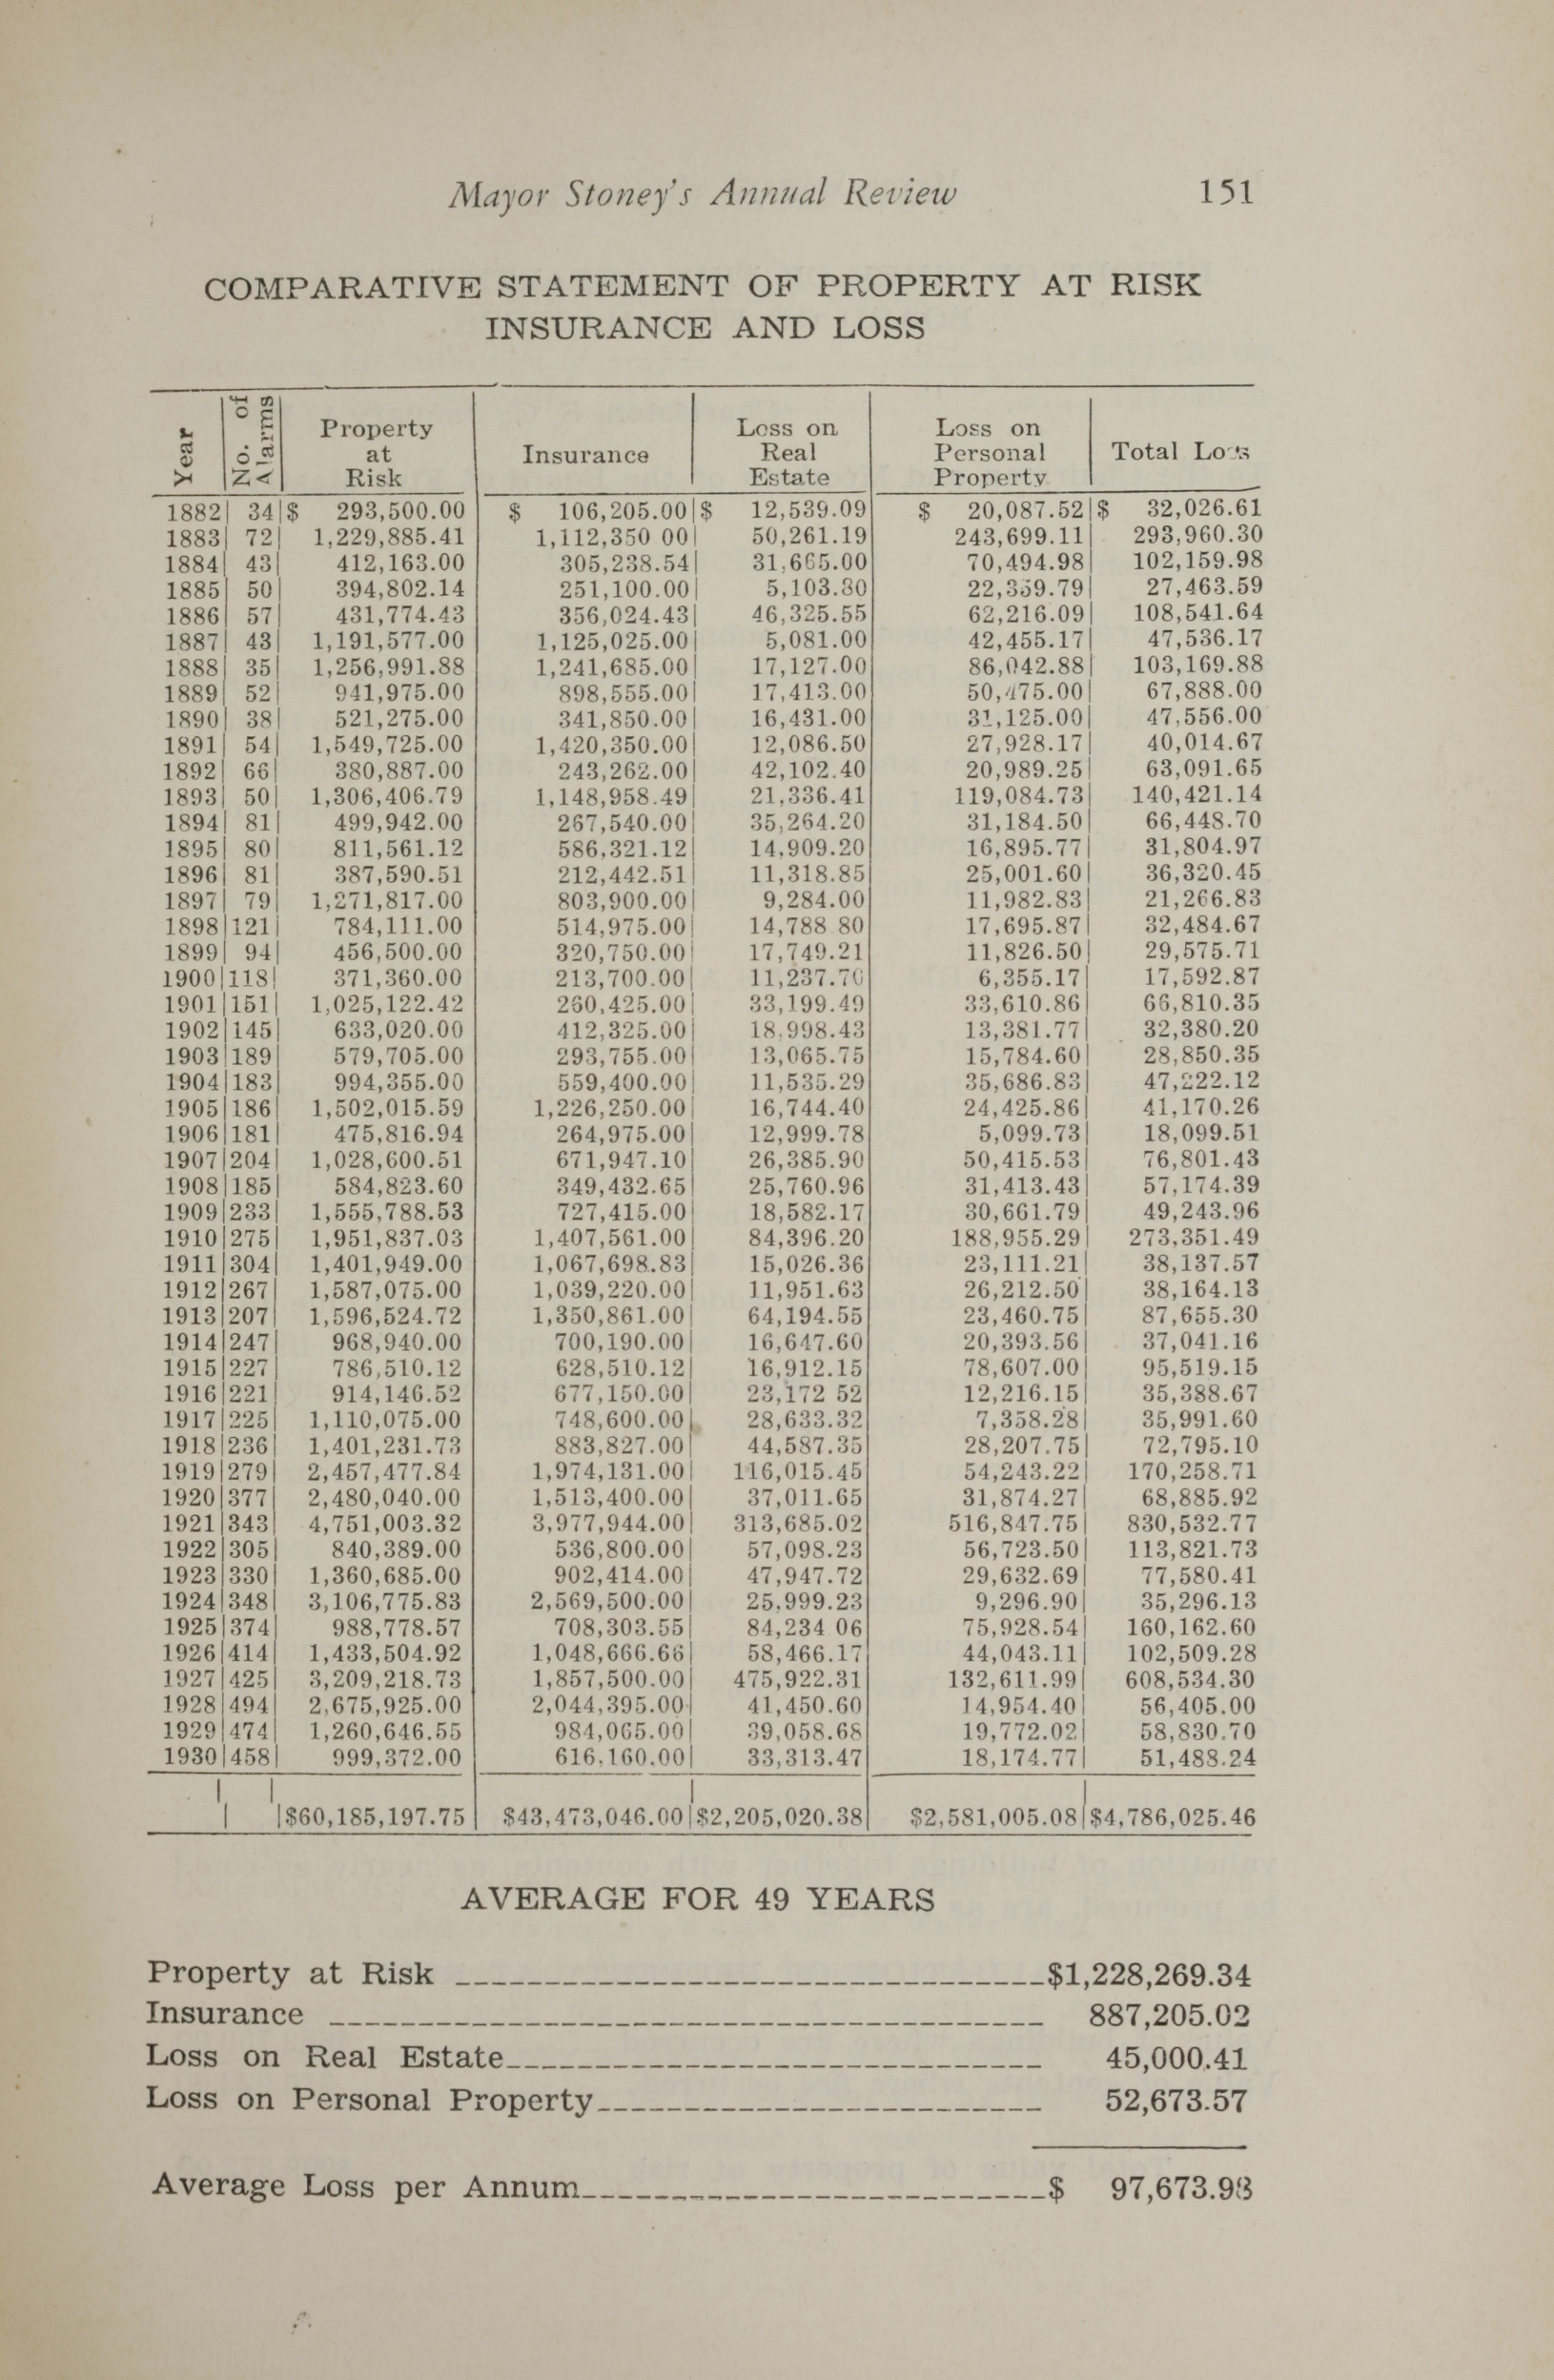 Charleston Yearbook, 1930, page 151